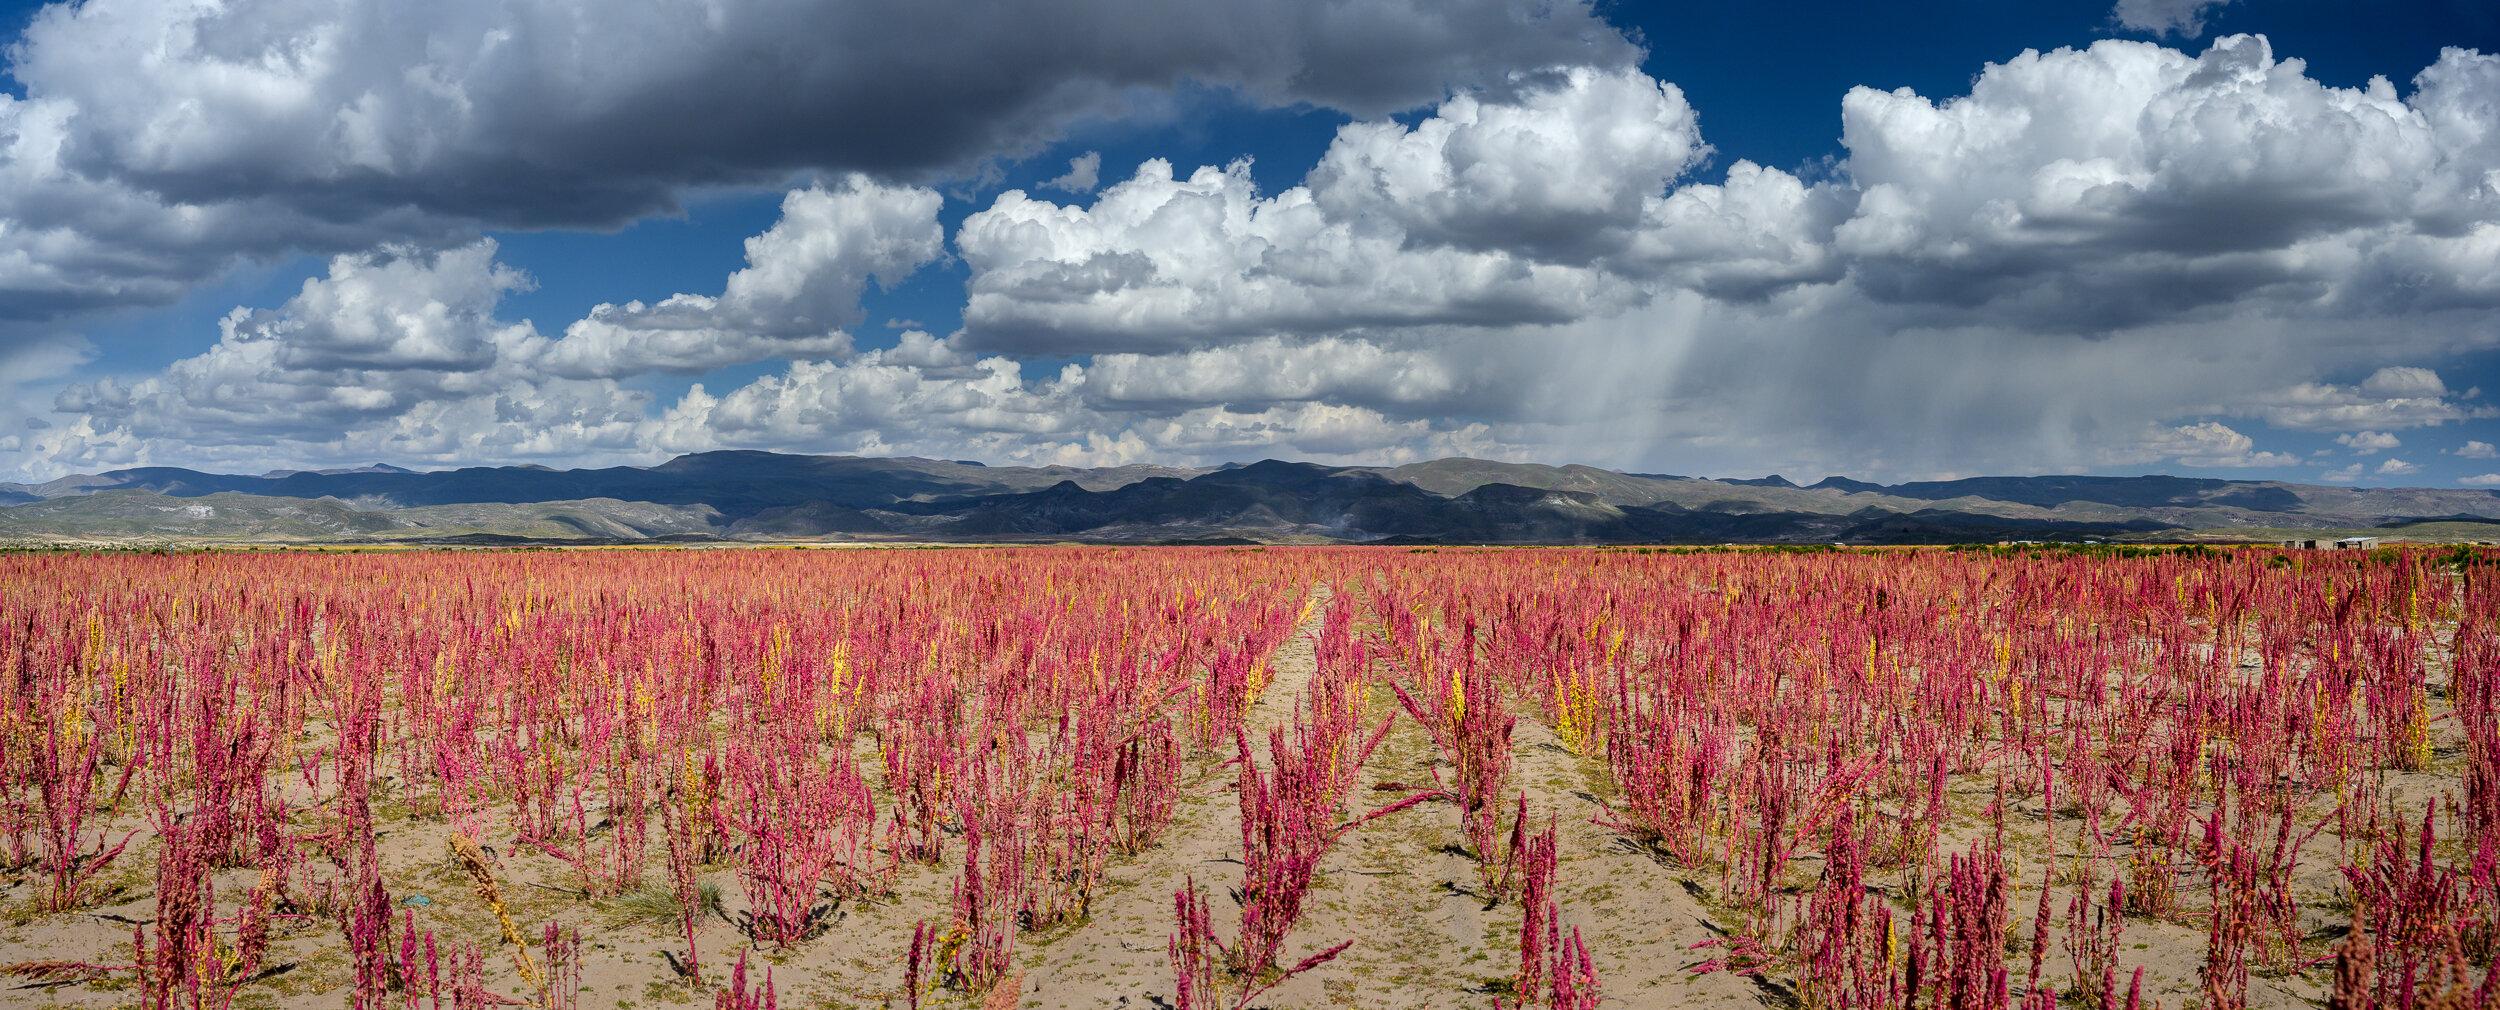 Bolivia-6914-Pano.jpg